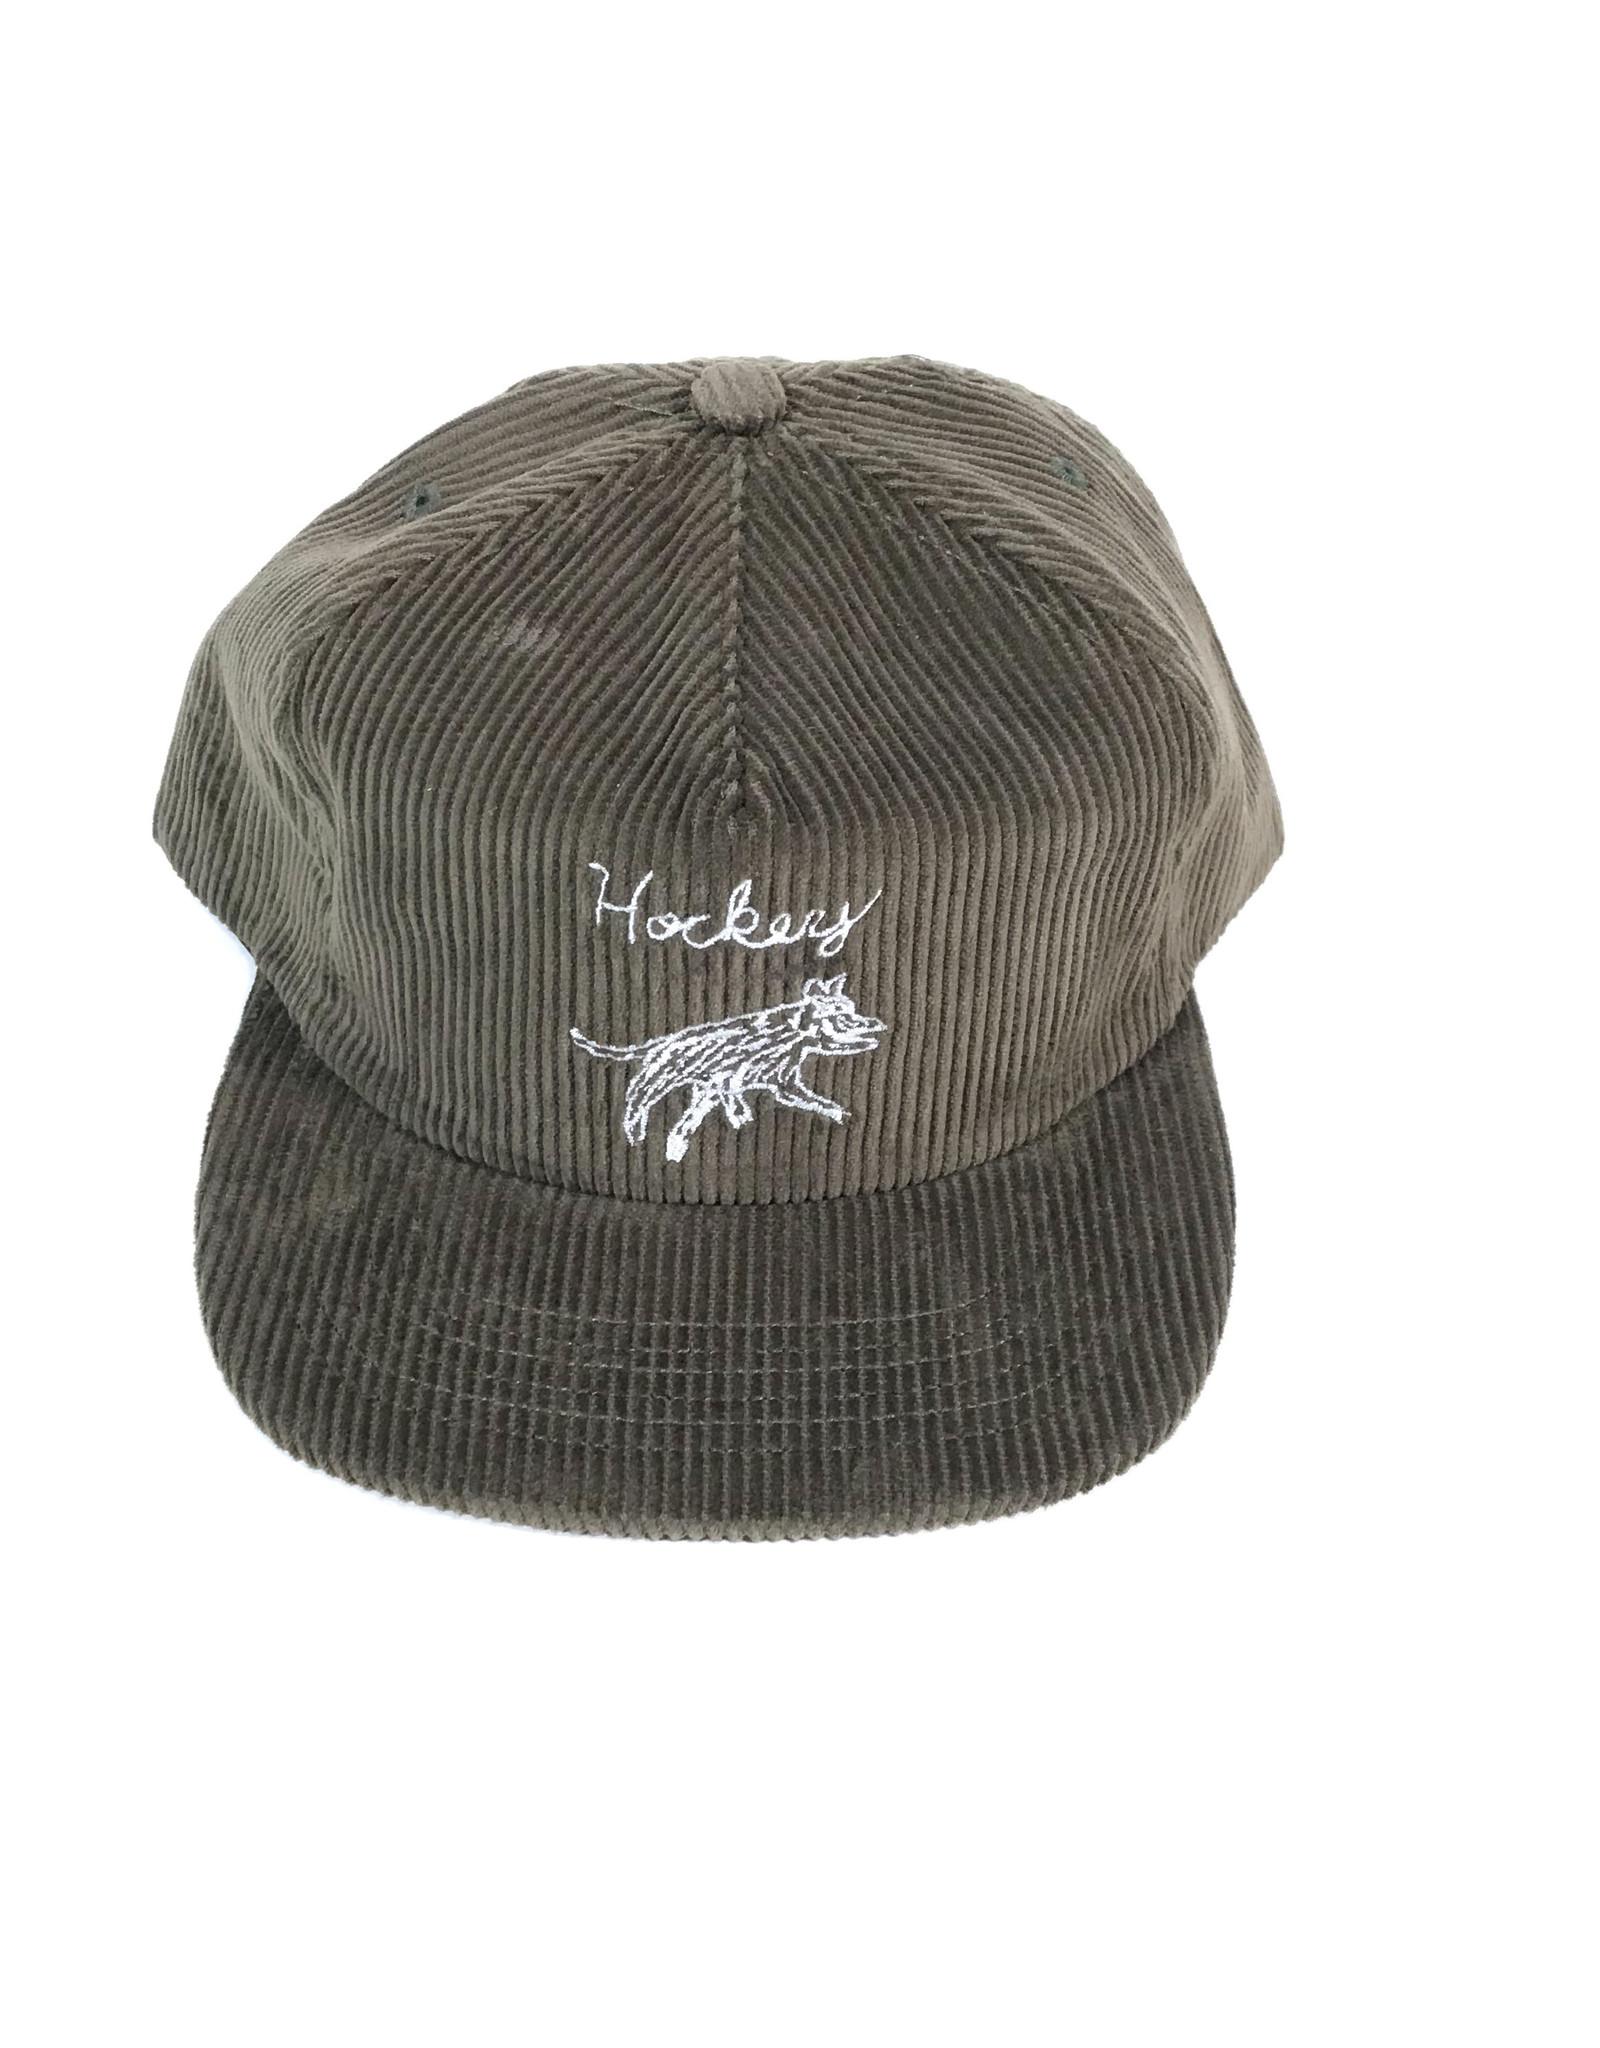 HOCKEY DOG 6 PANEL CORDUROY HAT - (ALL COLORS)